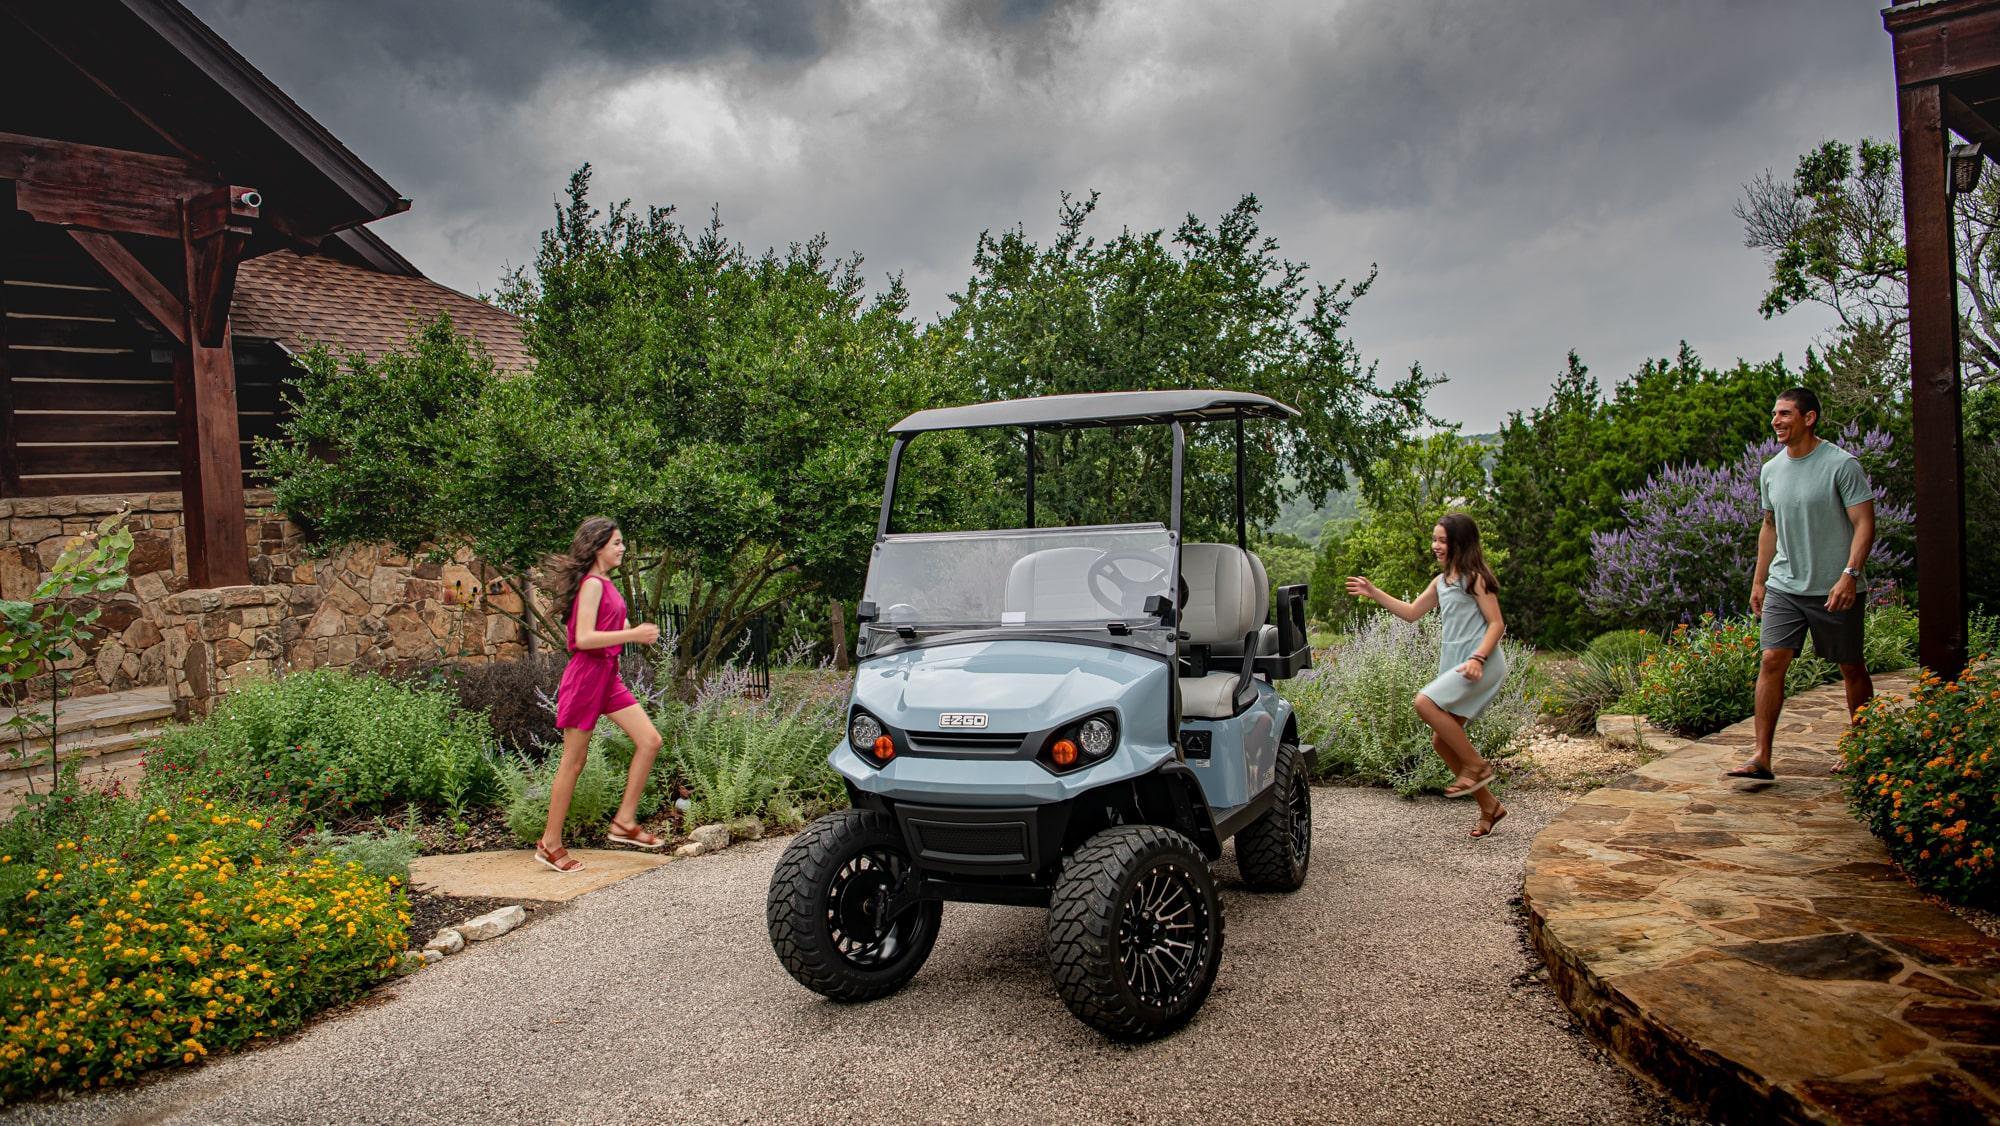 EZGO Dealer To Driveway golf cart purchasing program